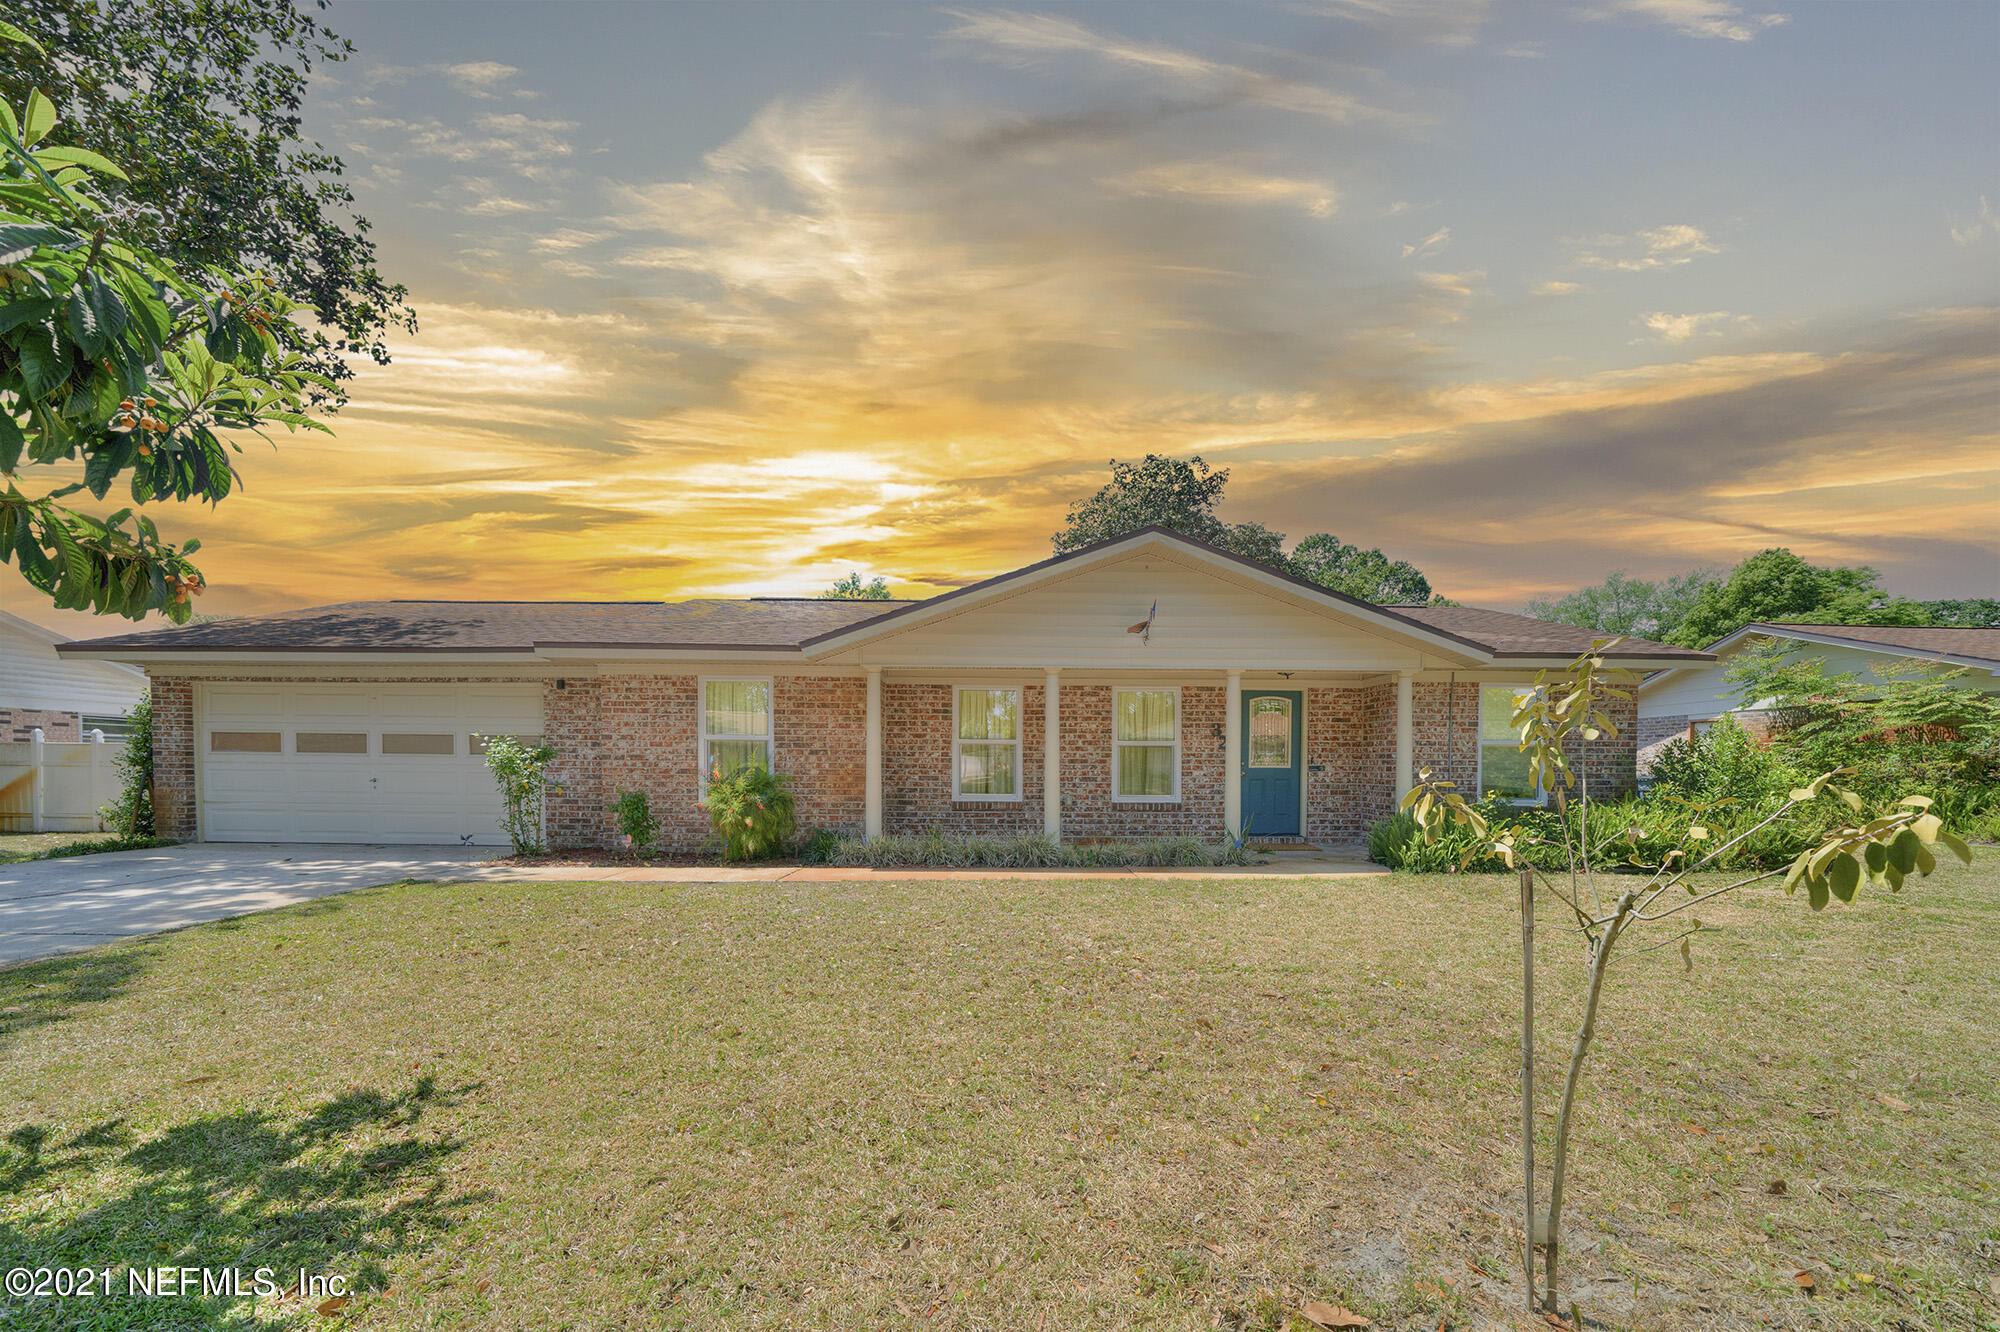 328 JAMES, ORANGE PARK, FLORIDA 32073, 3 Bedrooms Bedrooms, ,2 BathroomsBathrooms,Residential,For sale,JAMES,1104946